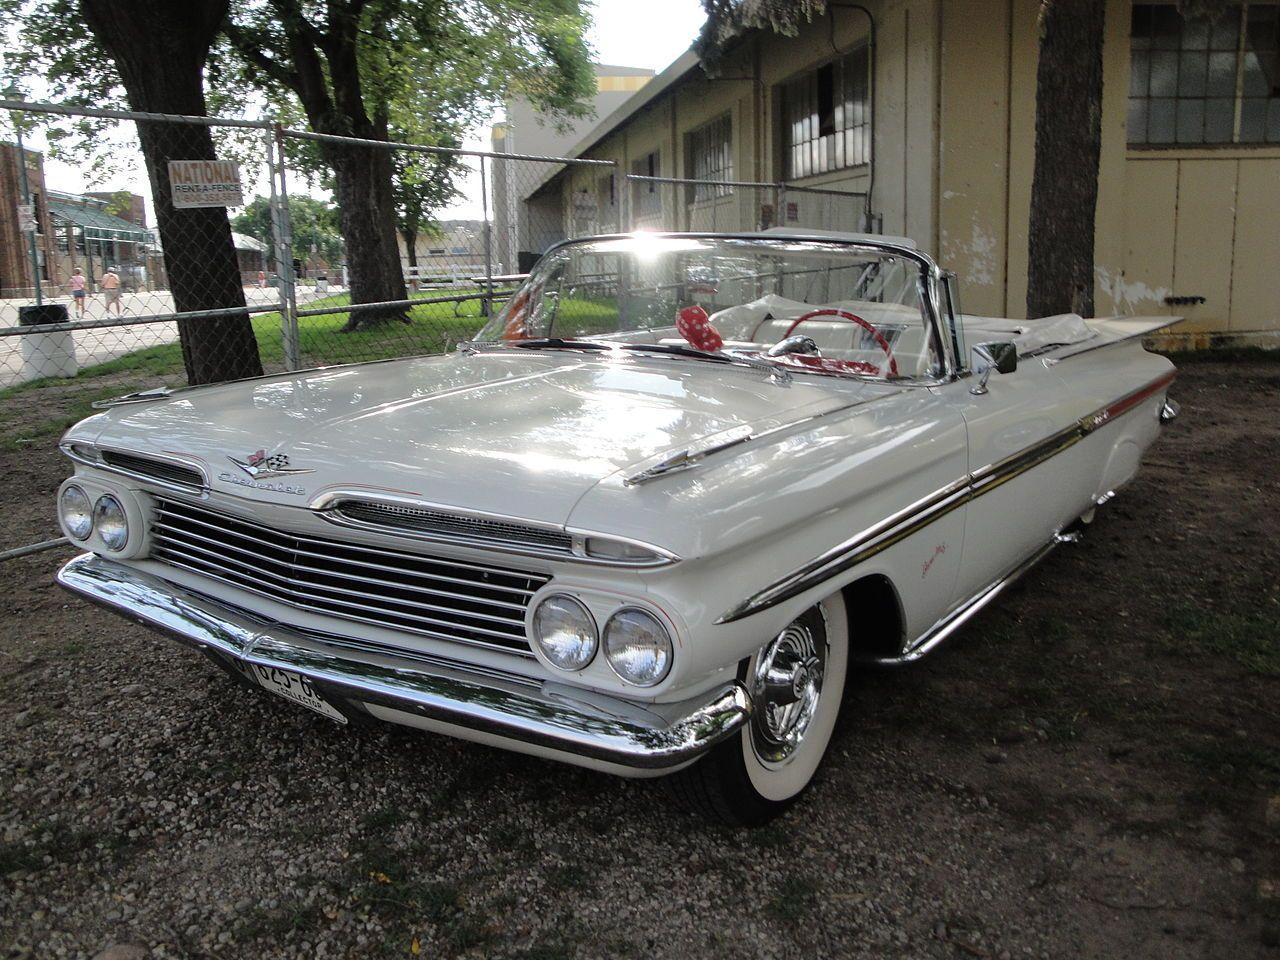 Cars and more chevy impala chevy impalas vehicles drag racing racing - 1959 Chevrolet Impala 7